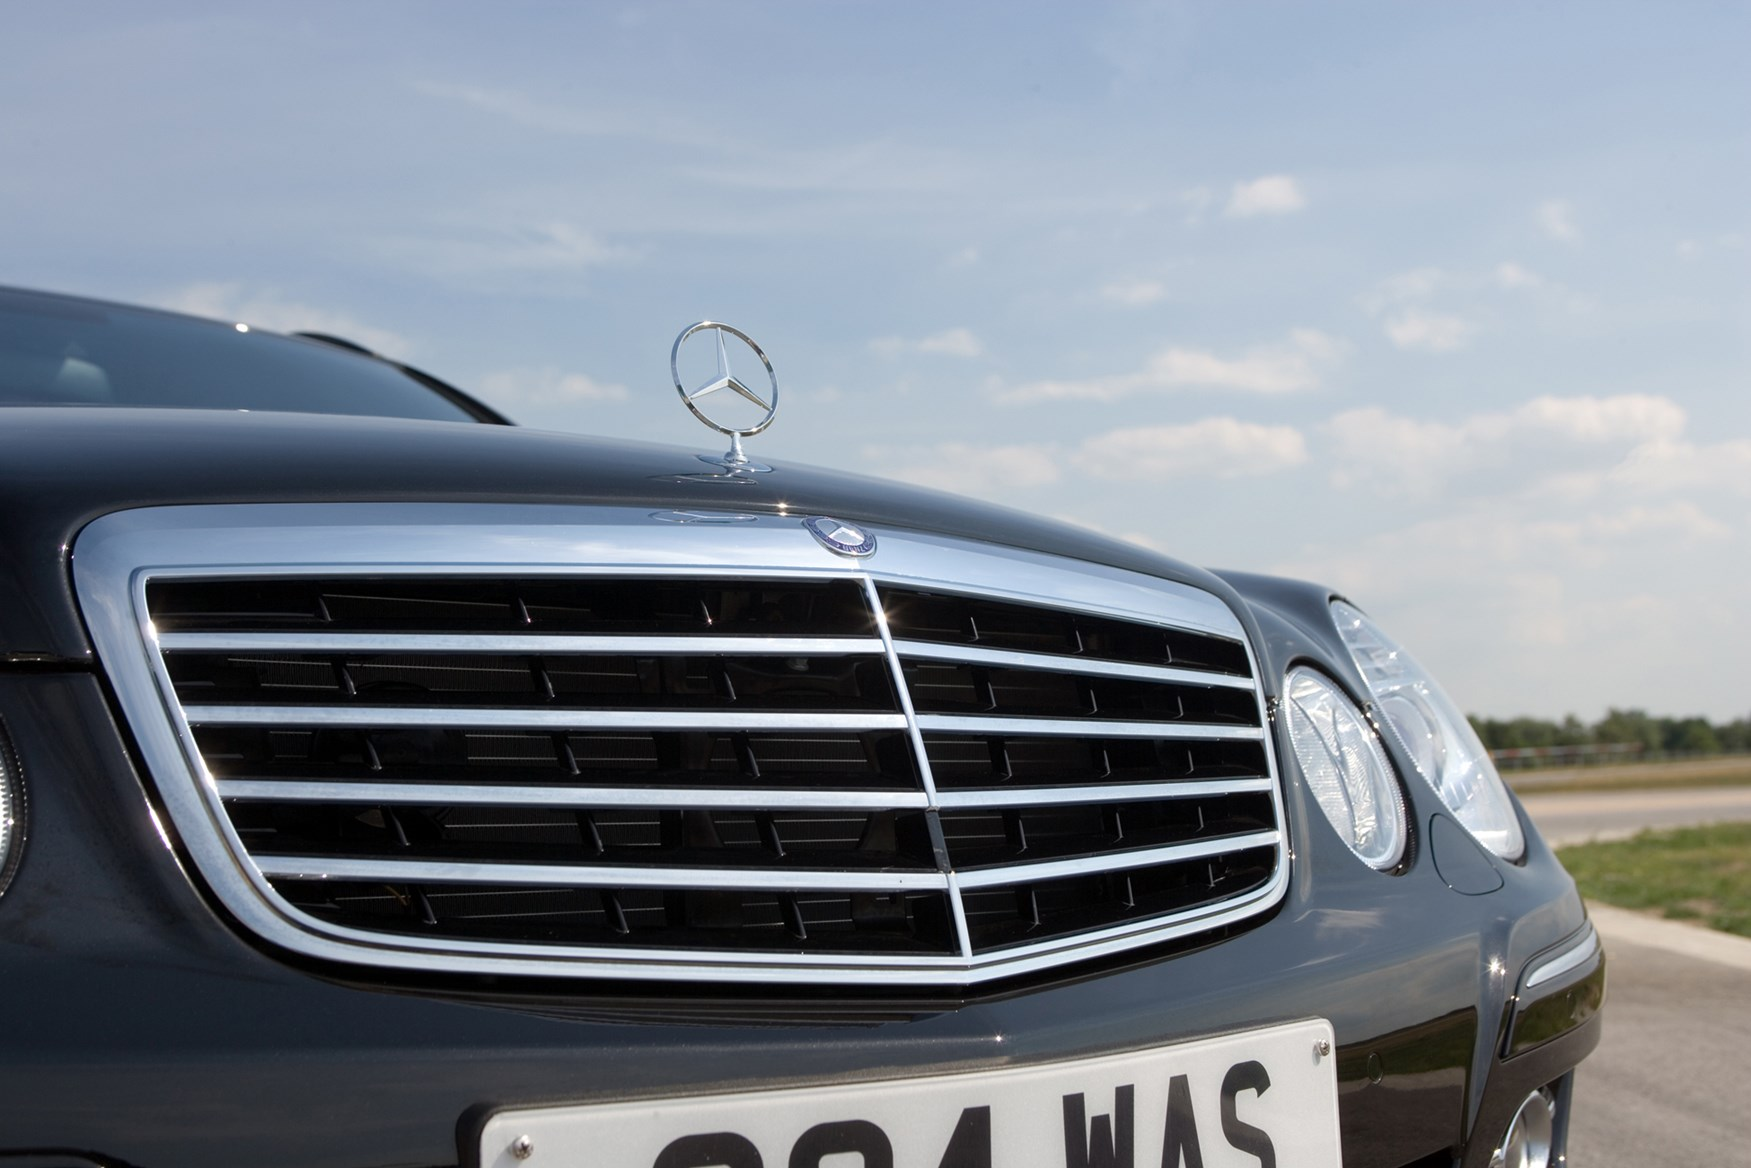 Mercedes benz e class estate 2003 2008 features for How much is a mercedes benz e class